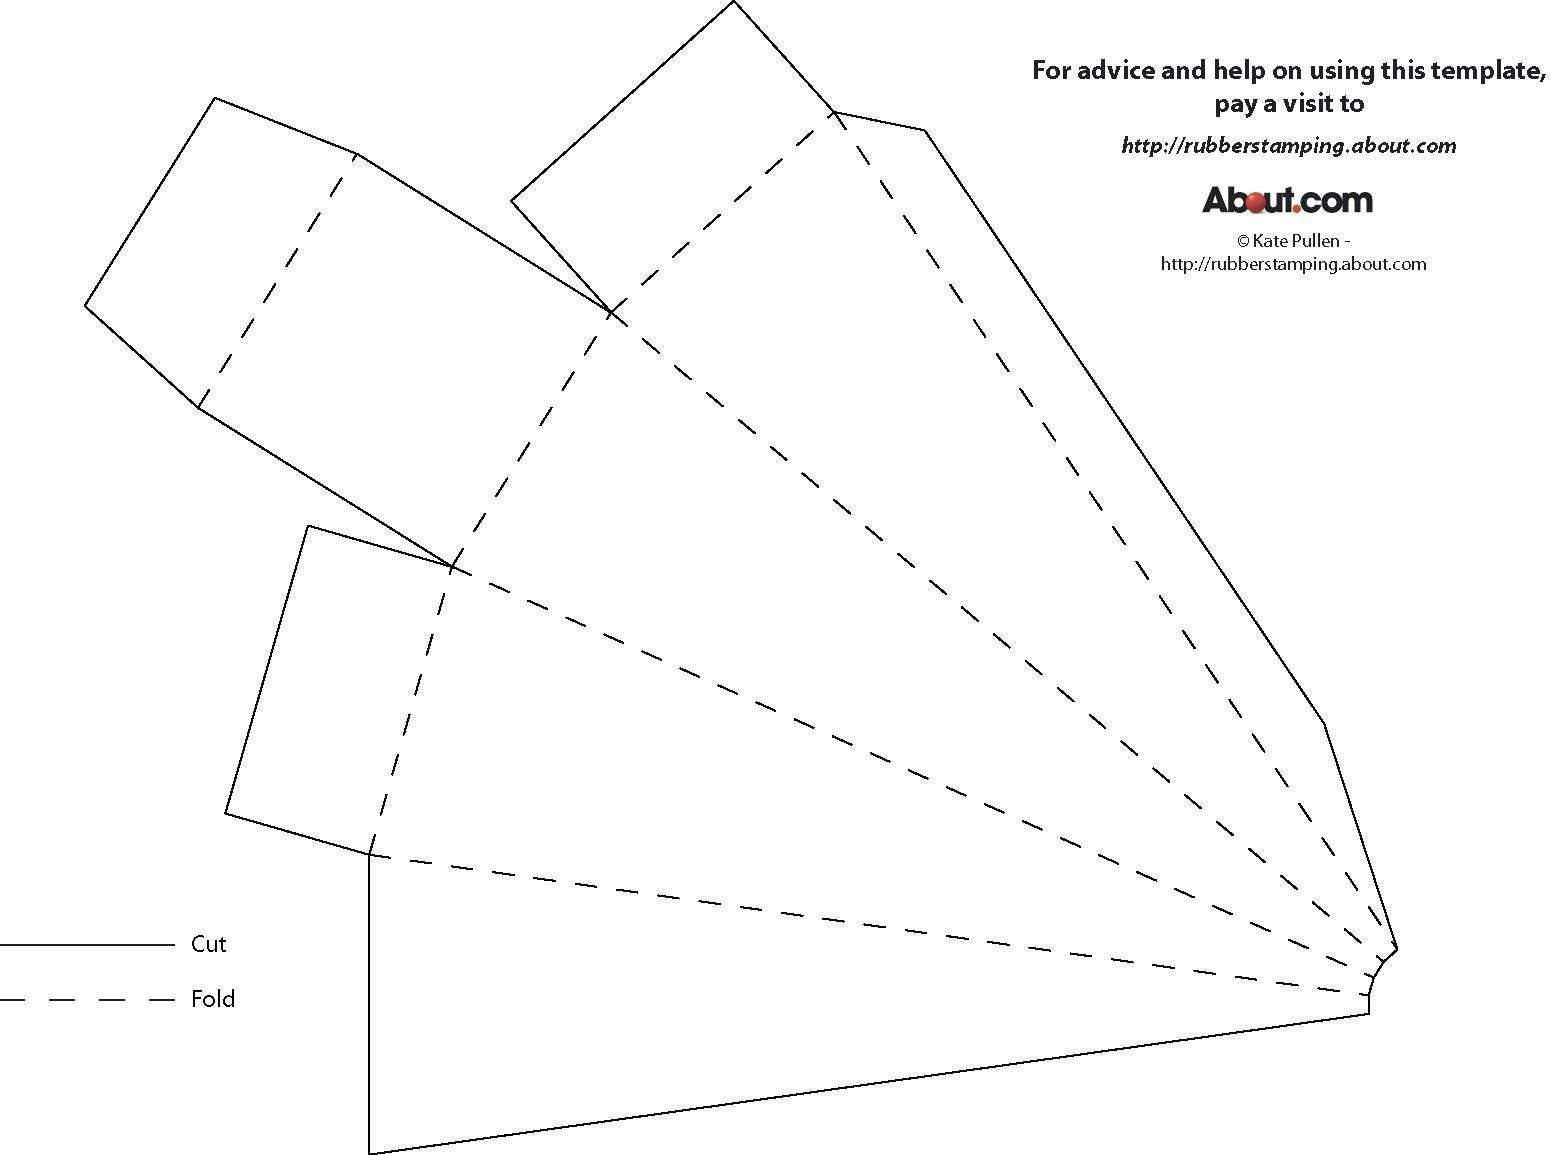 Excellent 1 Page Resume Format Download Huge 1 Page Resume Format Free Download Clean 1.5 Inch Hexagon Template 10 Best Resume Templates Old 110 Block Label Template Black12 Column Grid Template 328 Best Images About FAVOR BOX TEMPLATE On Pinterest   Gable ..